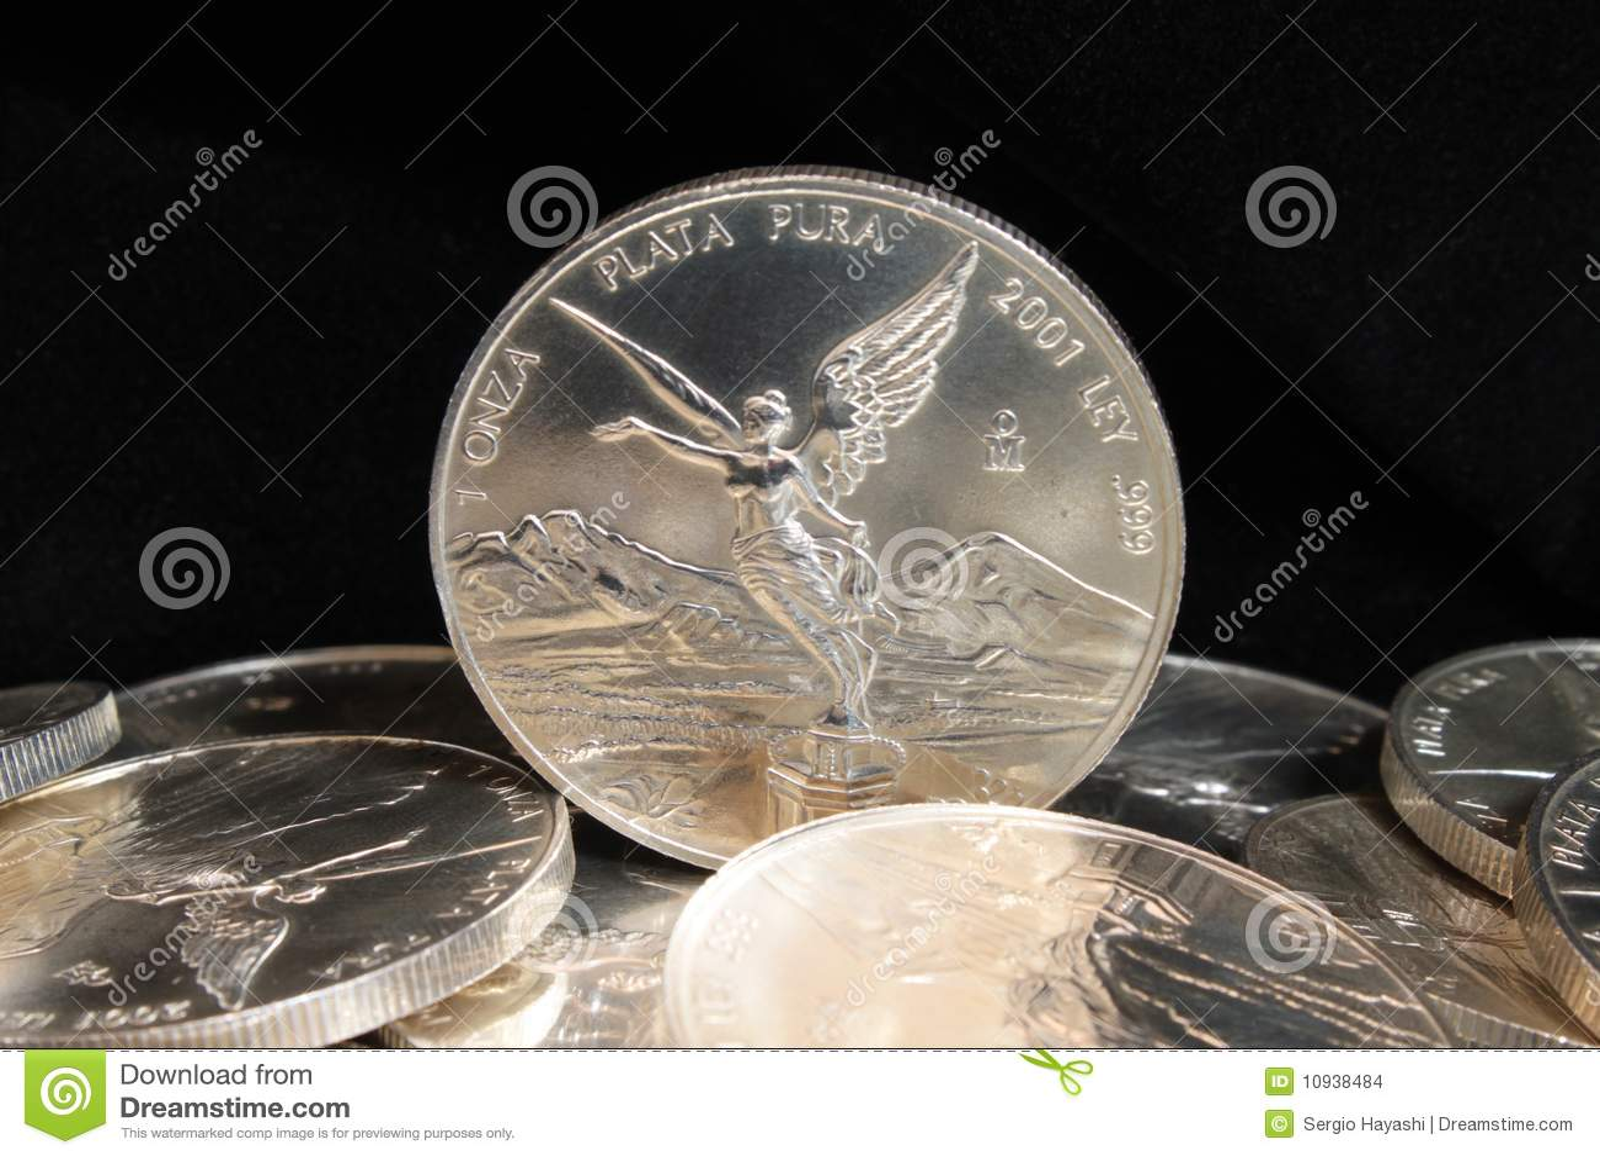 серебр onza 999 libertad чисто